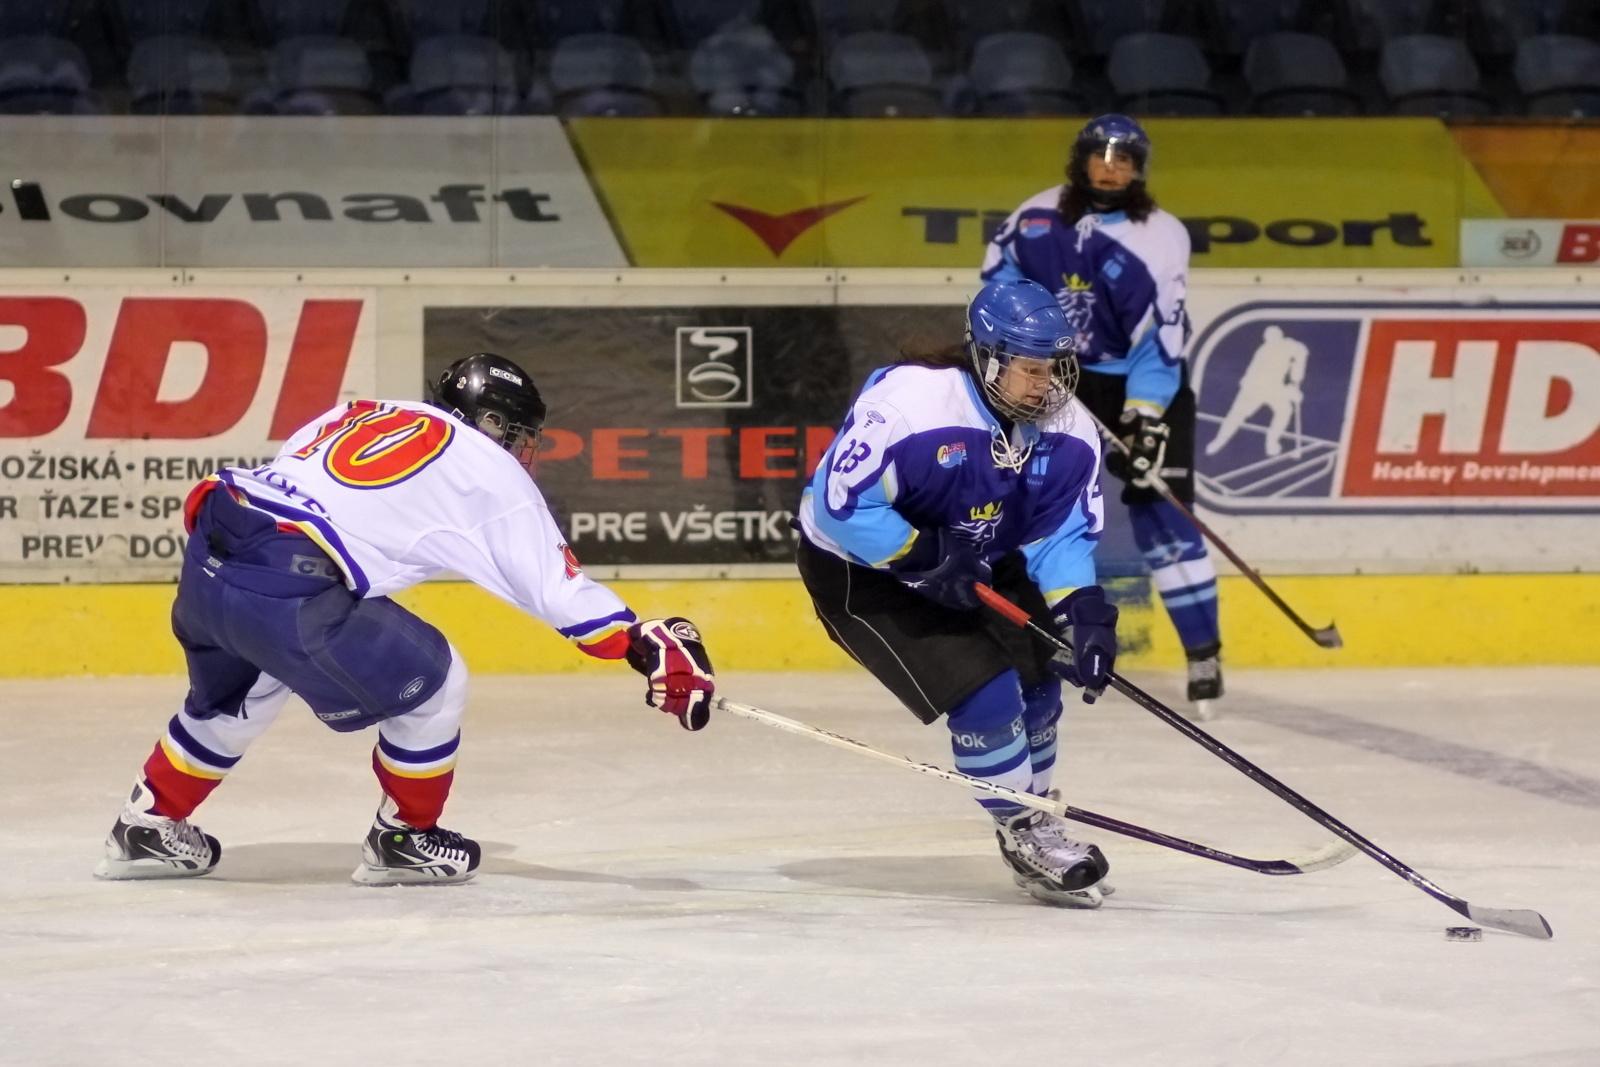 zhkm-zvolen-martin-hokej-2011-12